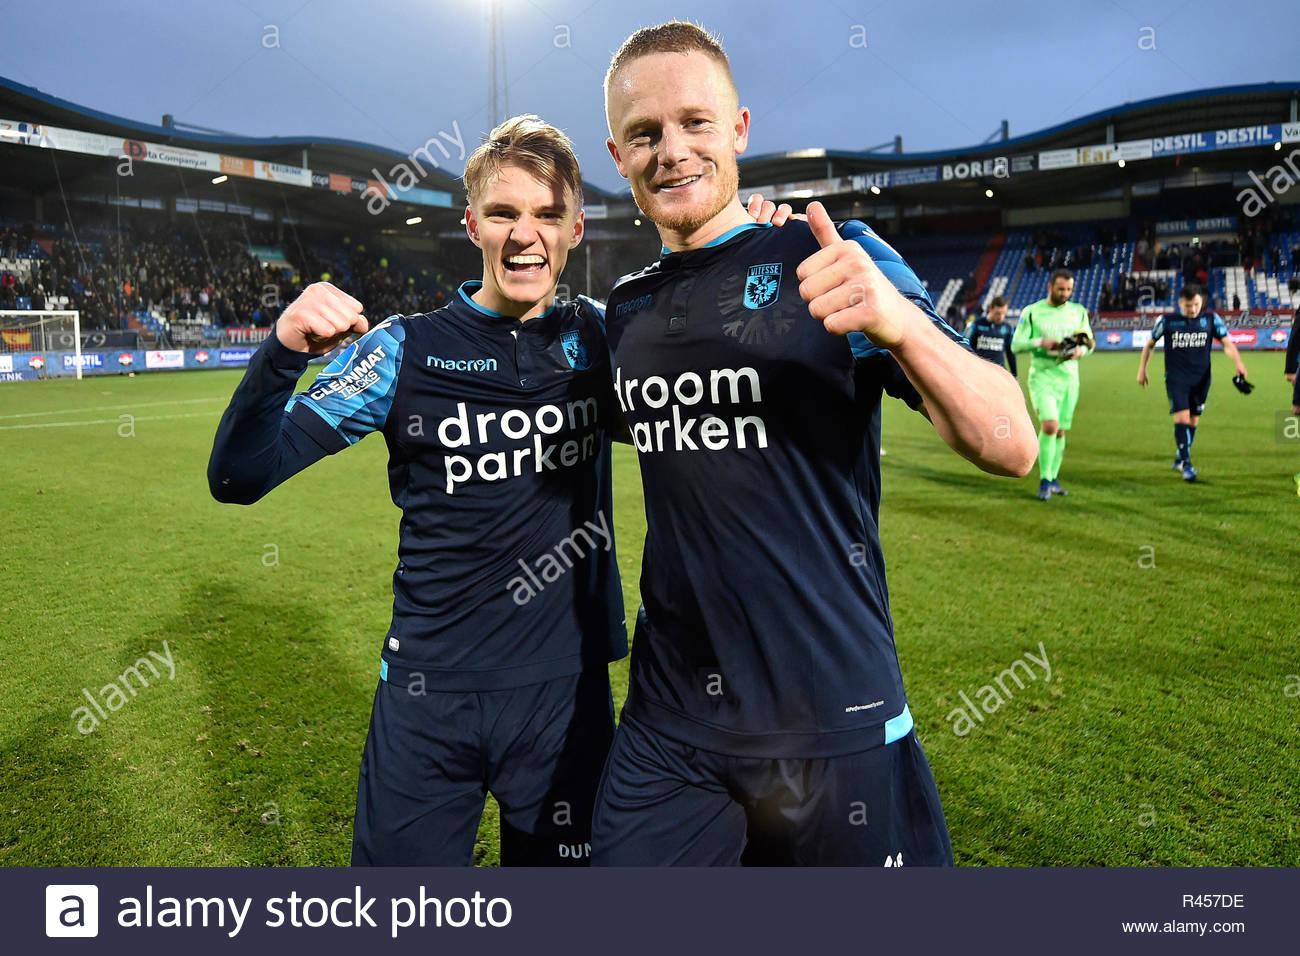 tilburg-25-11-2018-koning-willem-ii-stadium-season-2018-2019-dutch-eredivisie-martin-odegaard-and-rasmus-thelander-celebrating-the-win-after-the-match-R457DE